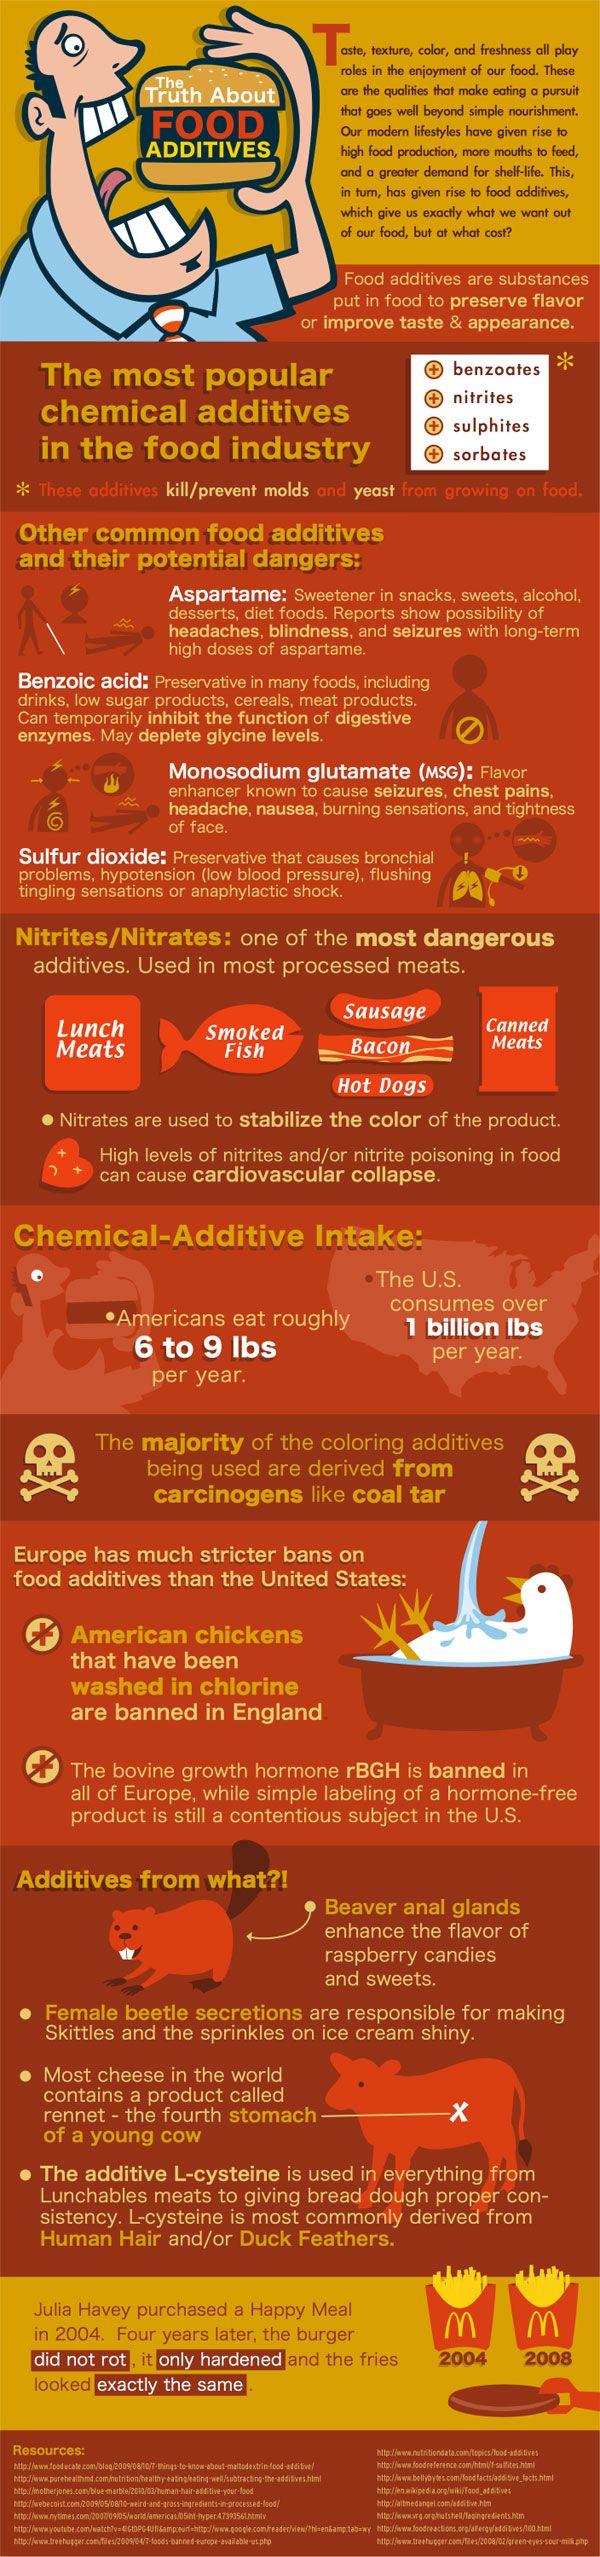 http://onegr.pl/1kBVBjX #health #foodadditives